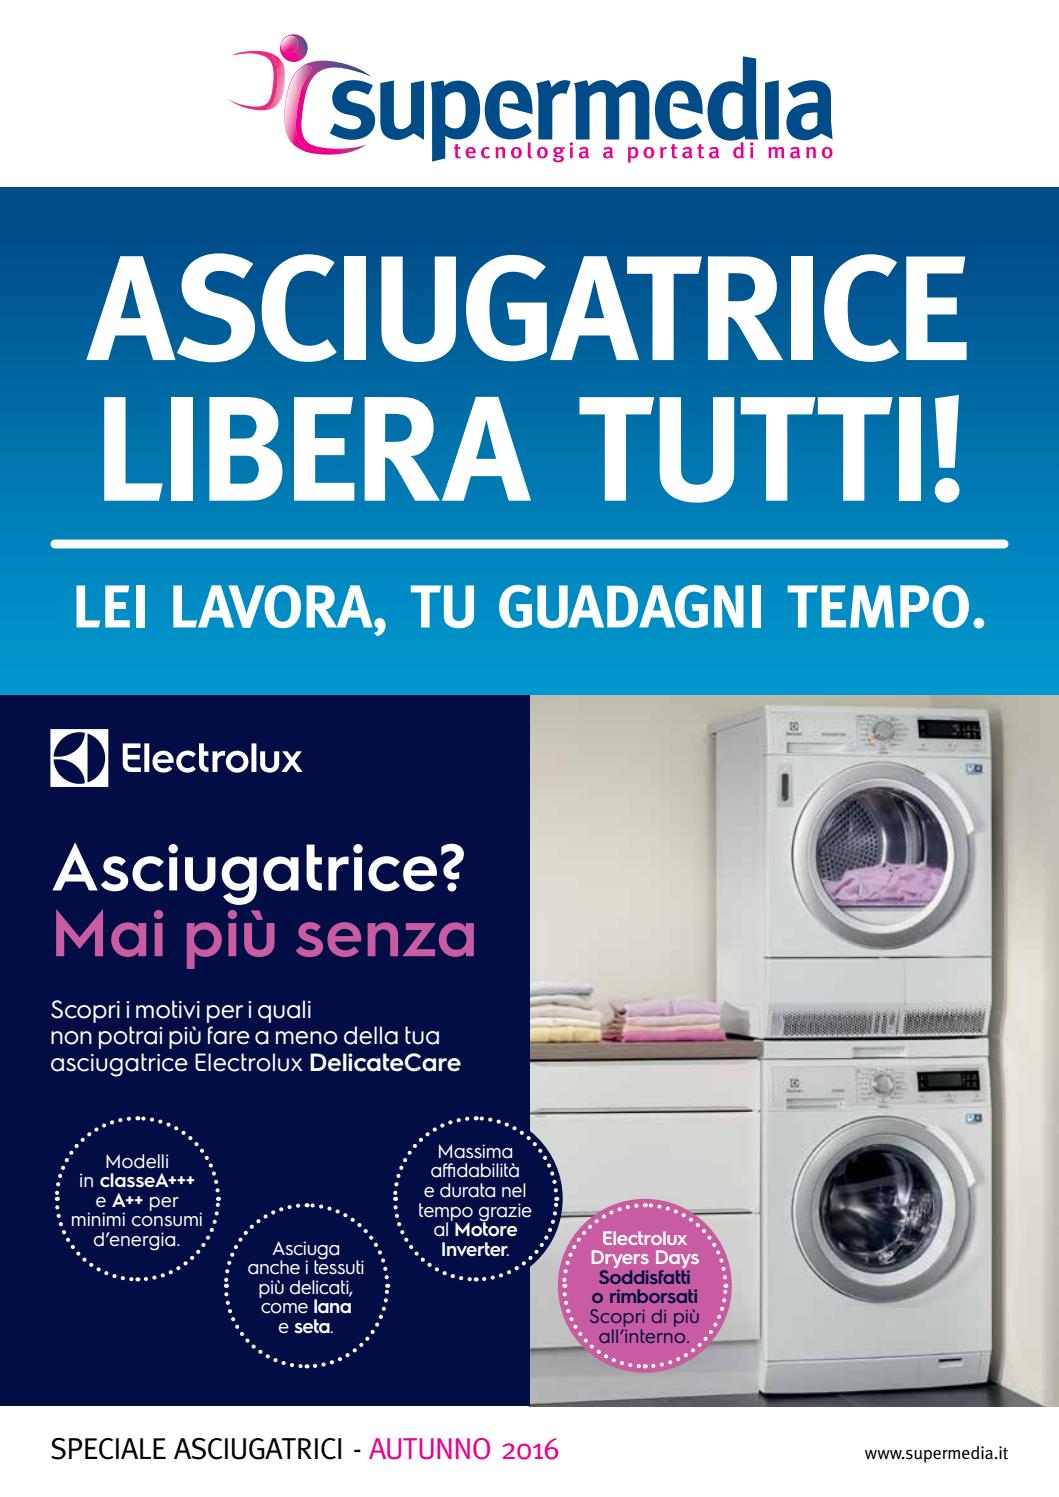 free shipping ba09b a7f1f Asciugatrice libera tutti! by Supermedia.it - issuu